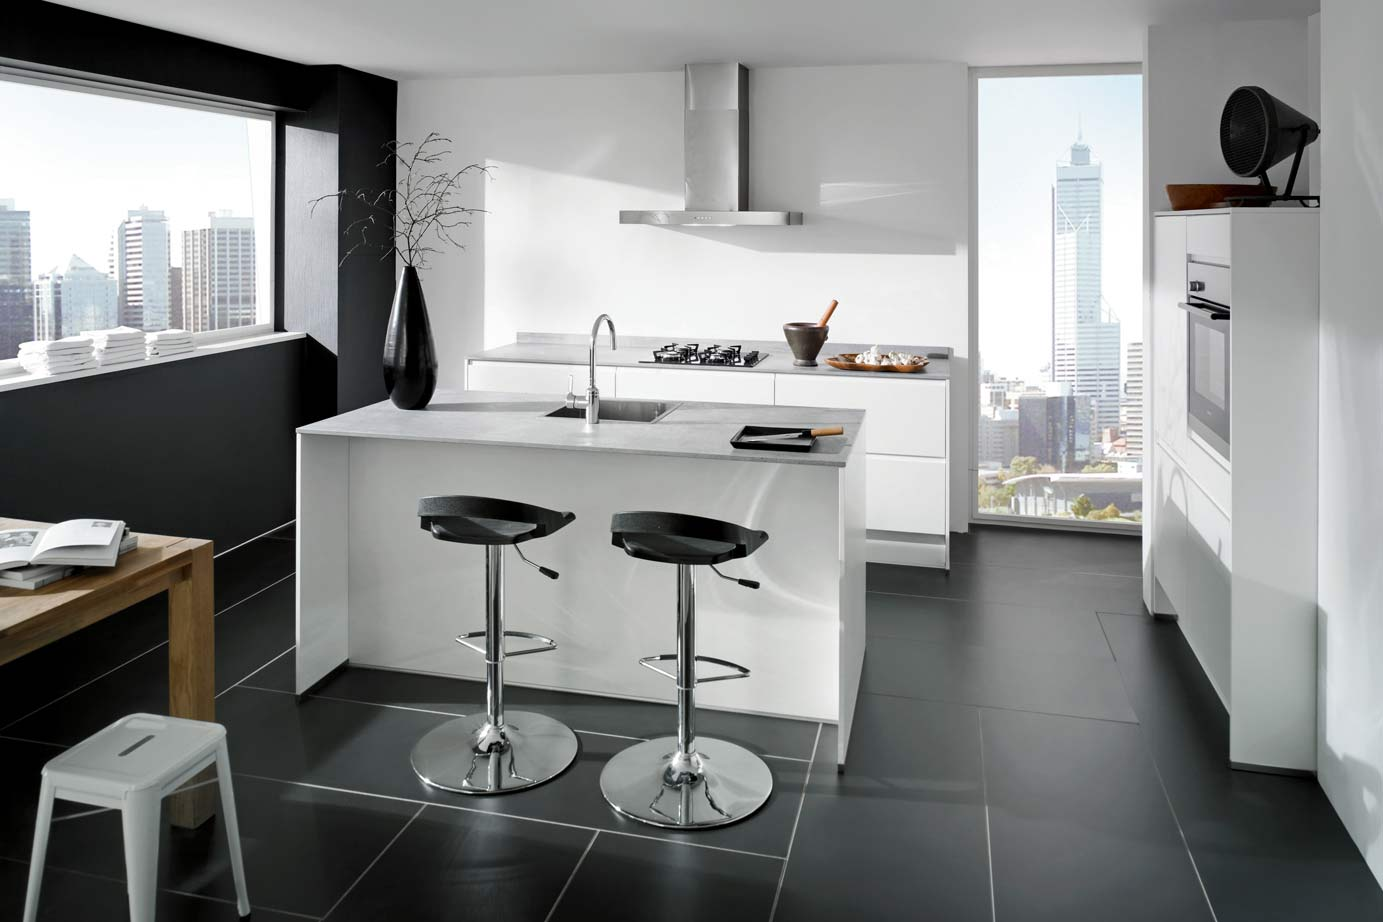 Keuken ontwerp eettafel eiland - Eiland keukentafel ...